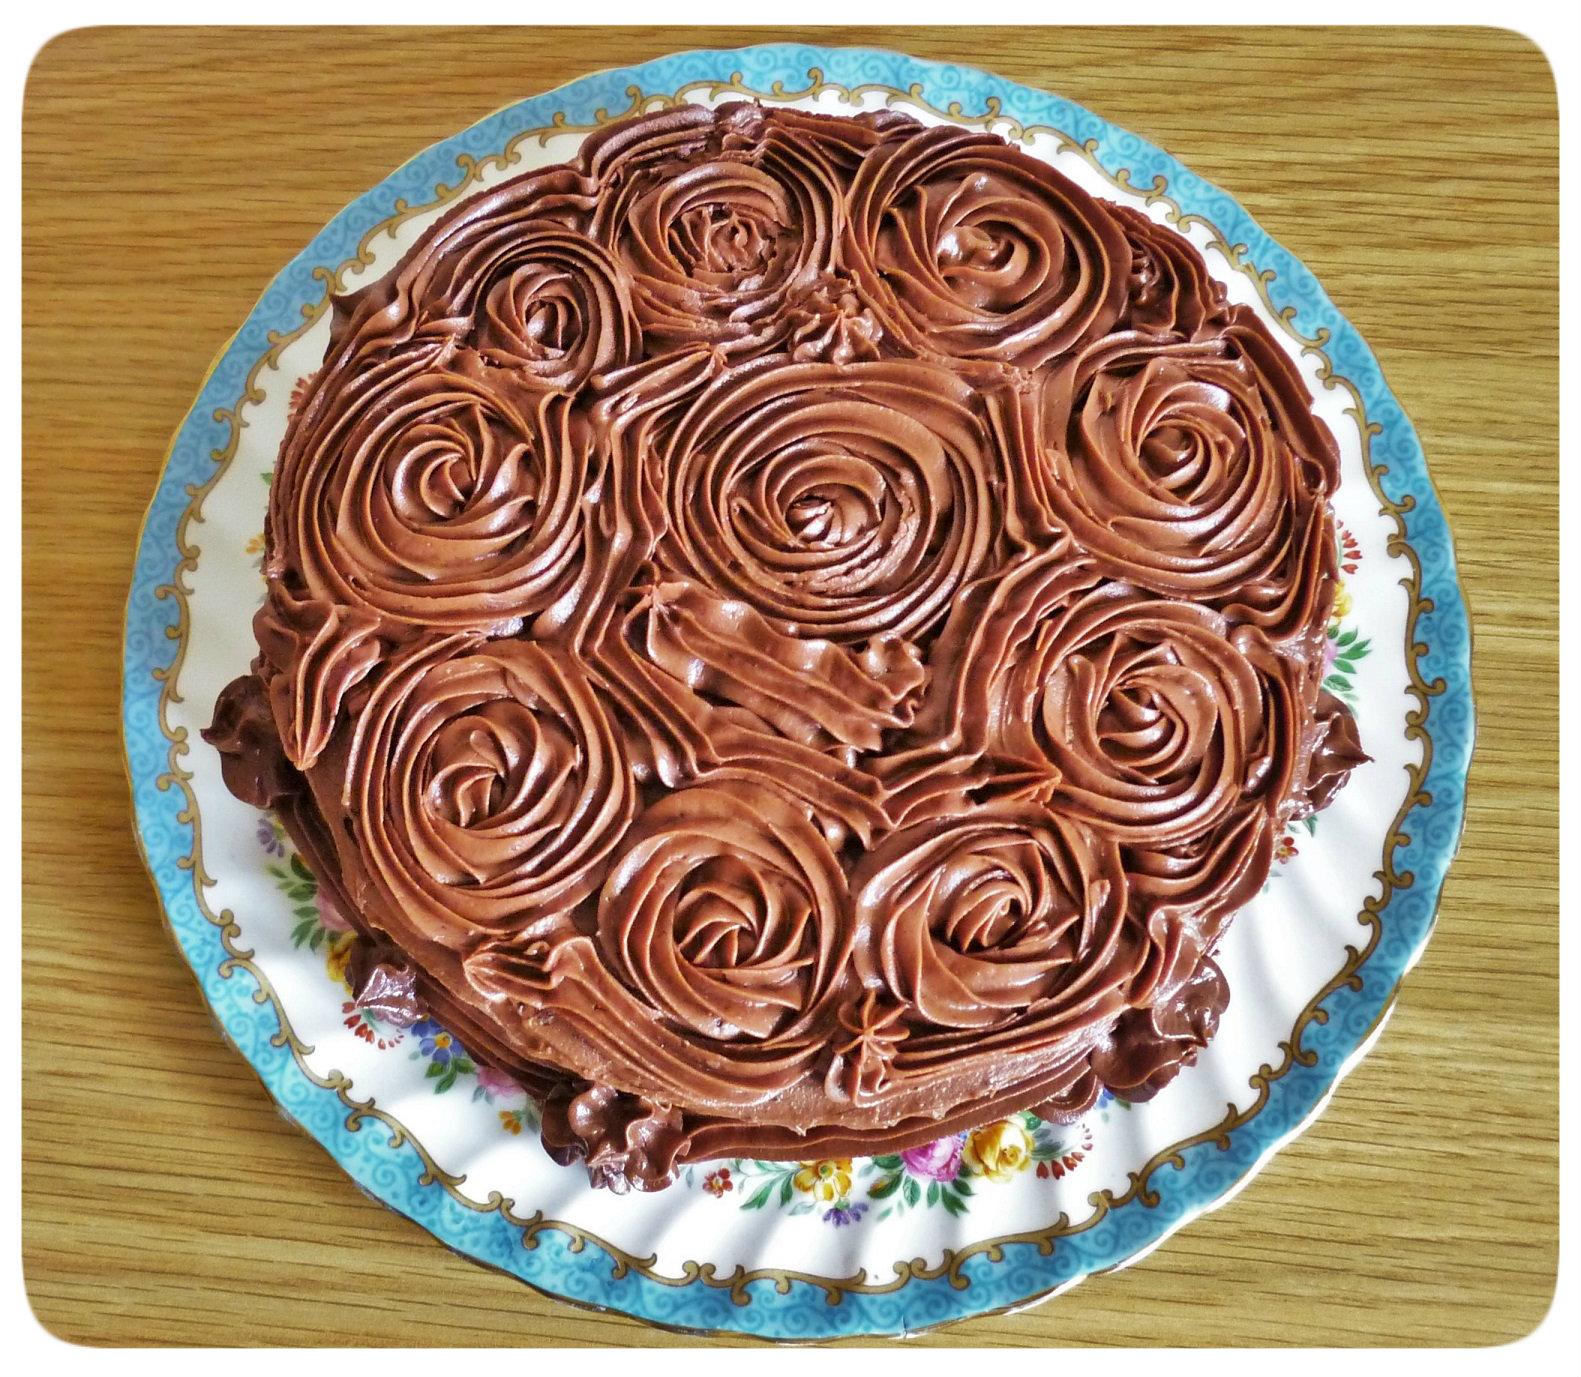 Recipe Chocolate Fudge Cake With Chocolate Buttercream